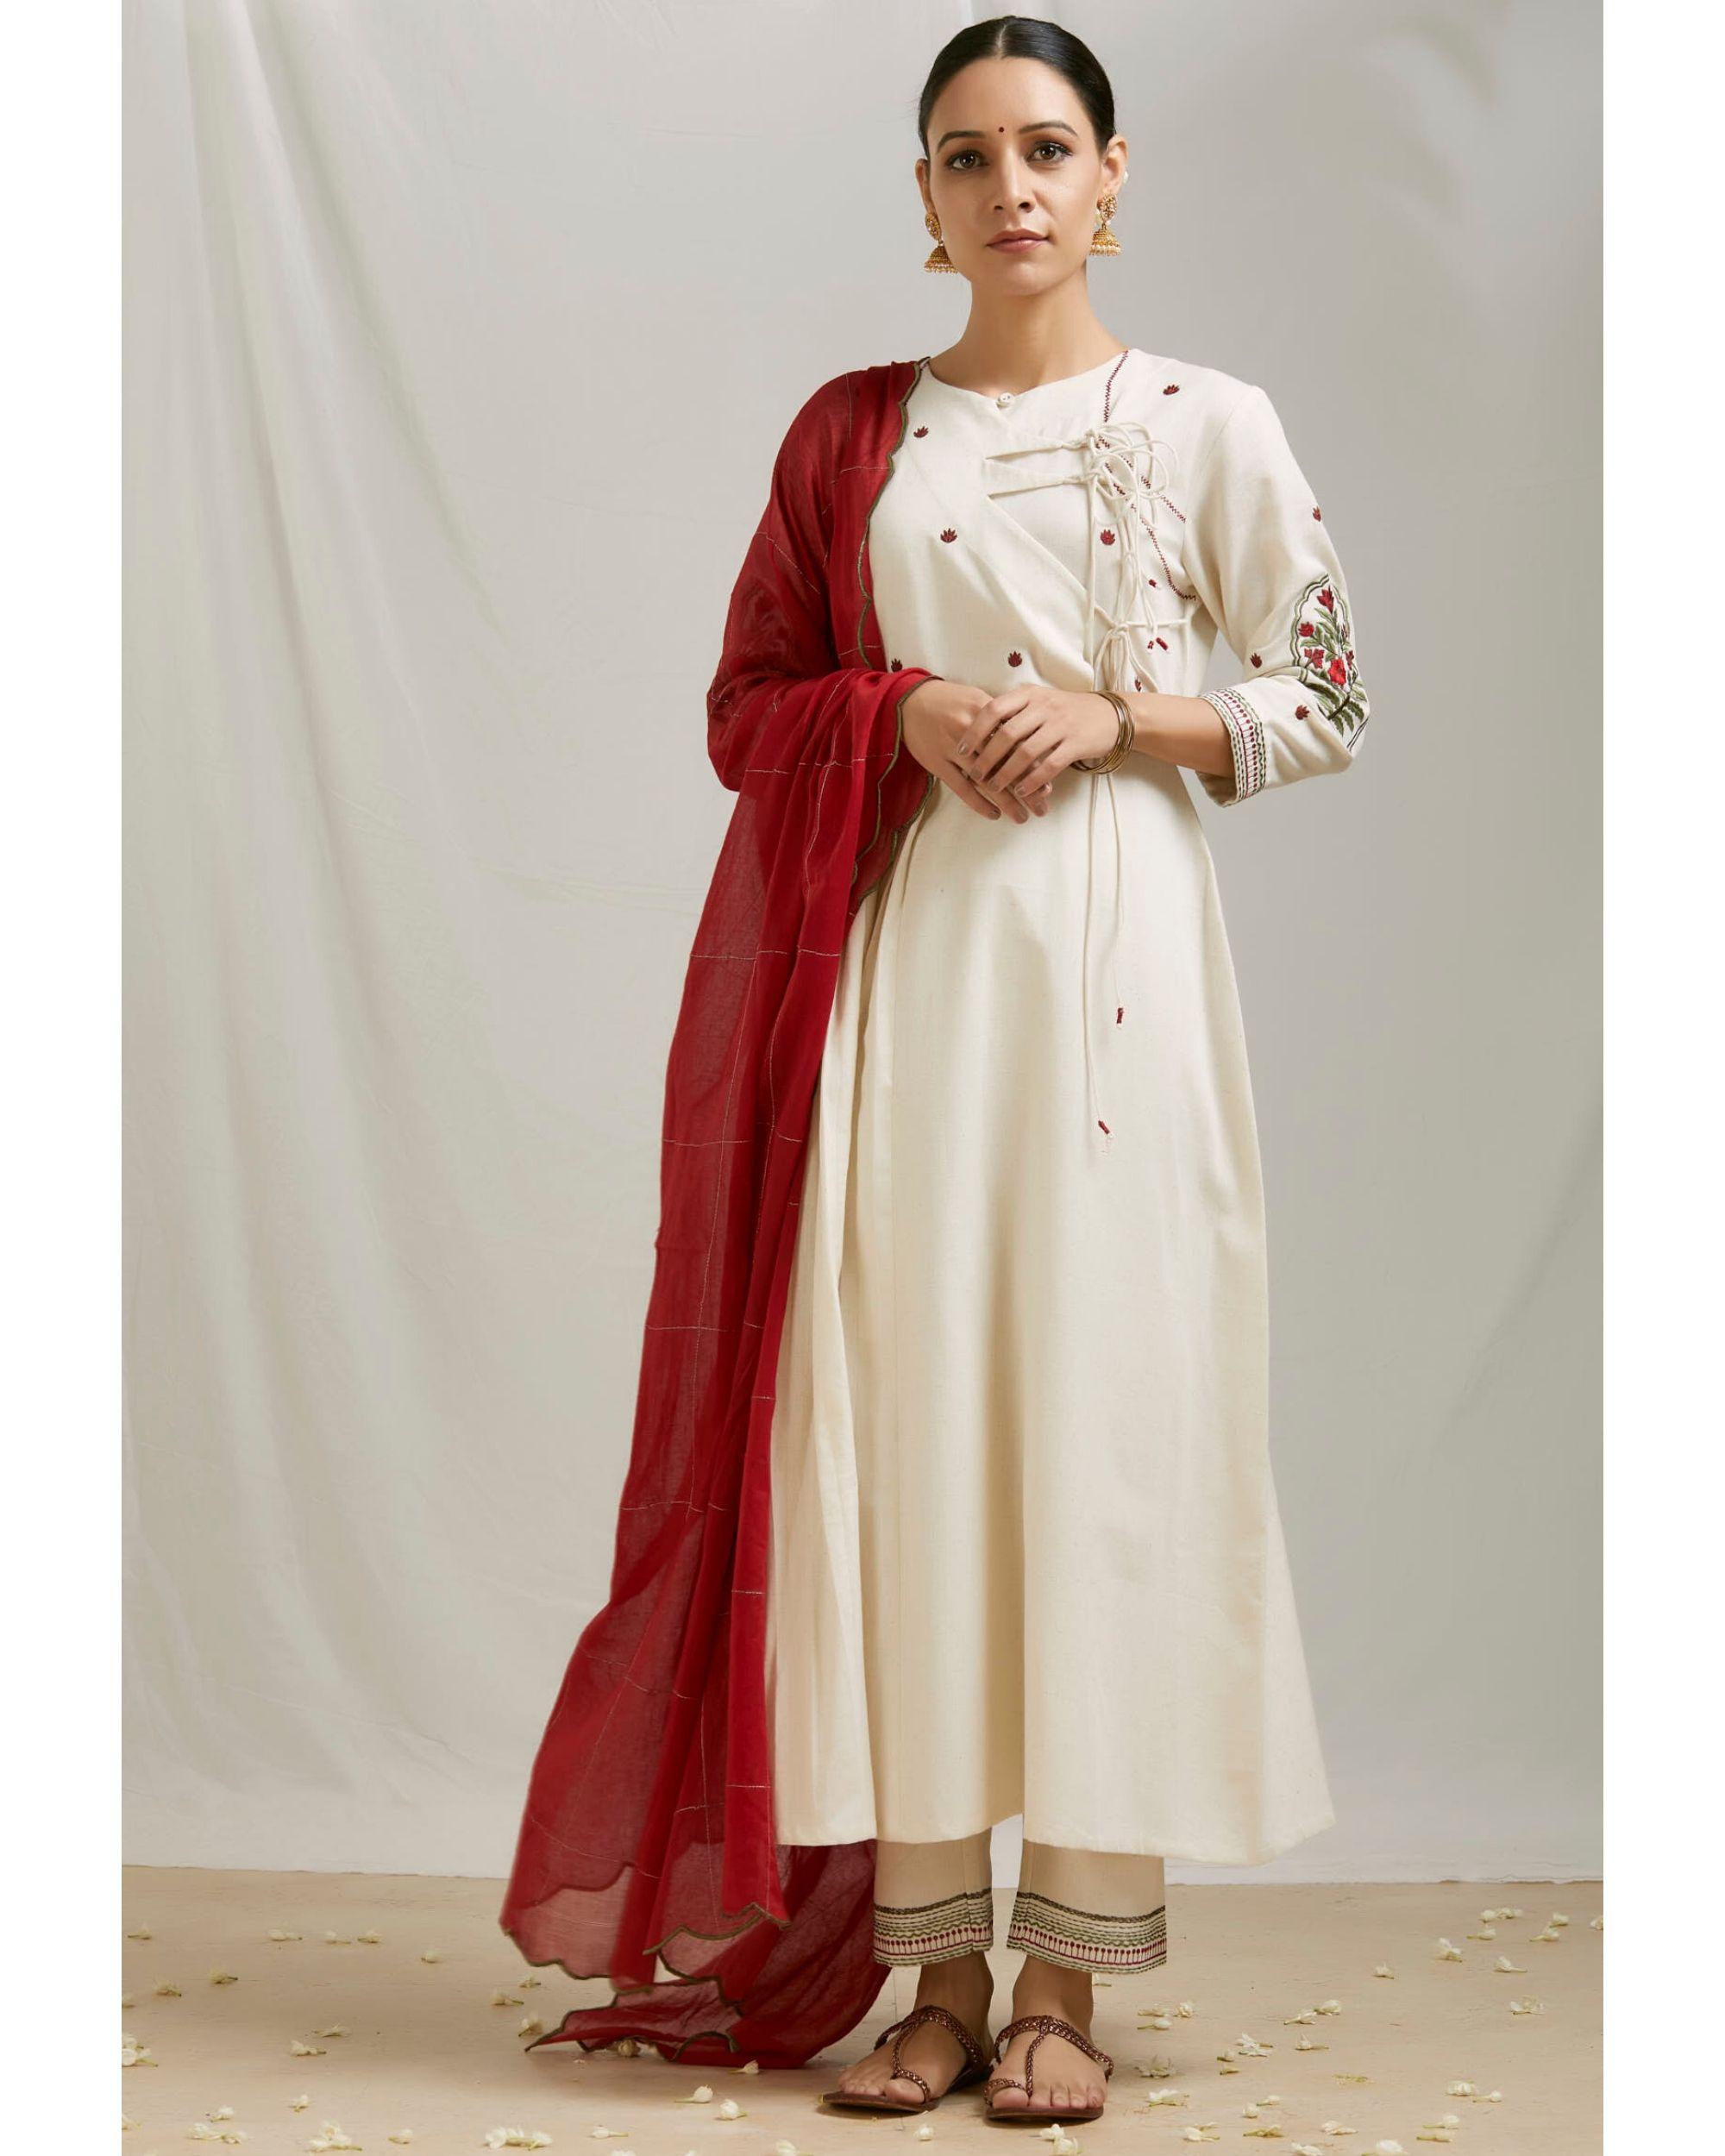 Ivory floral embroidered angrakha kurta and pants with dupatta- Set Of Three